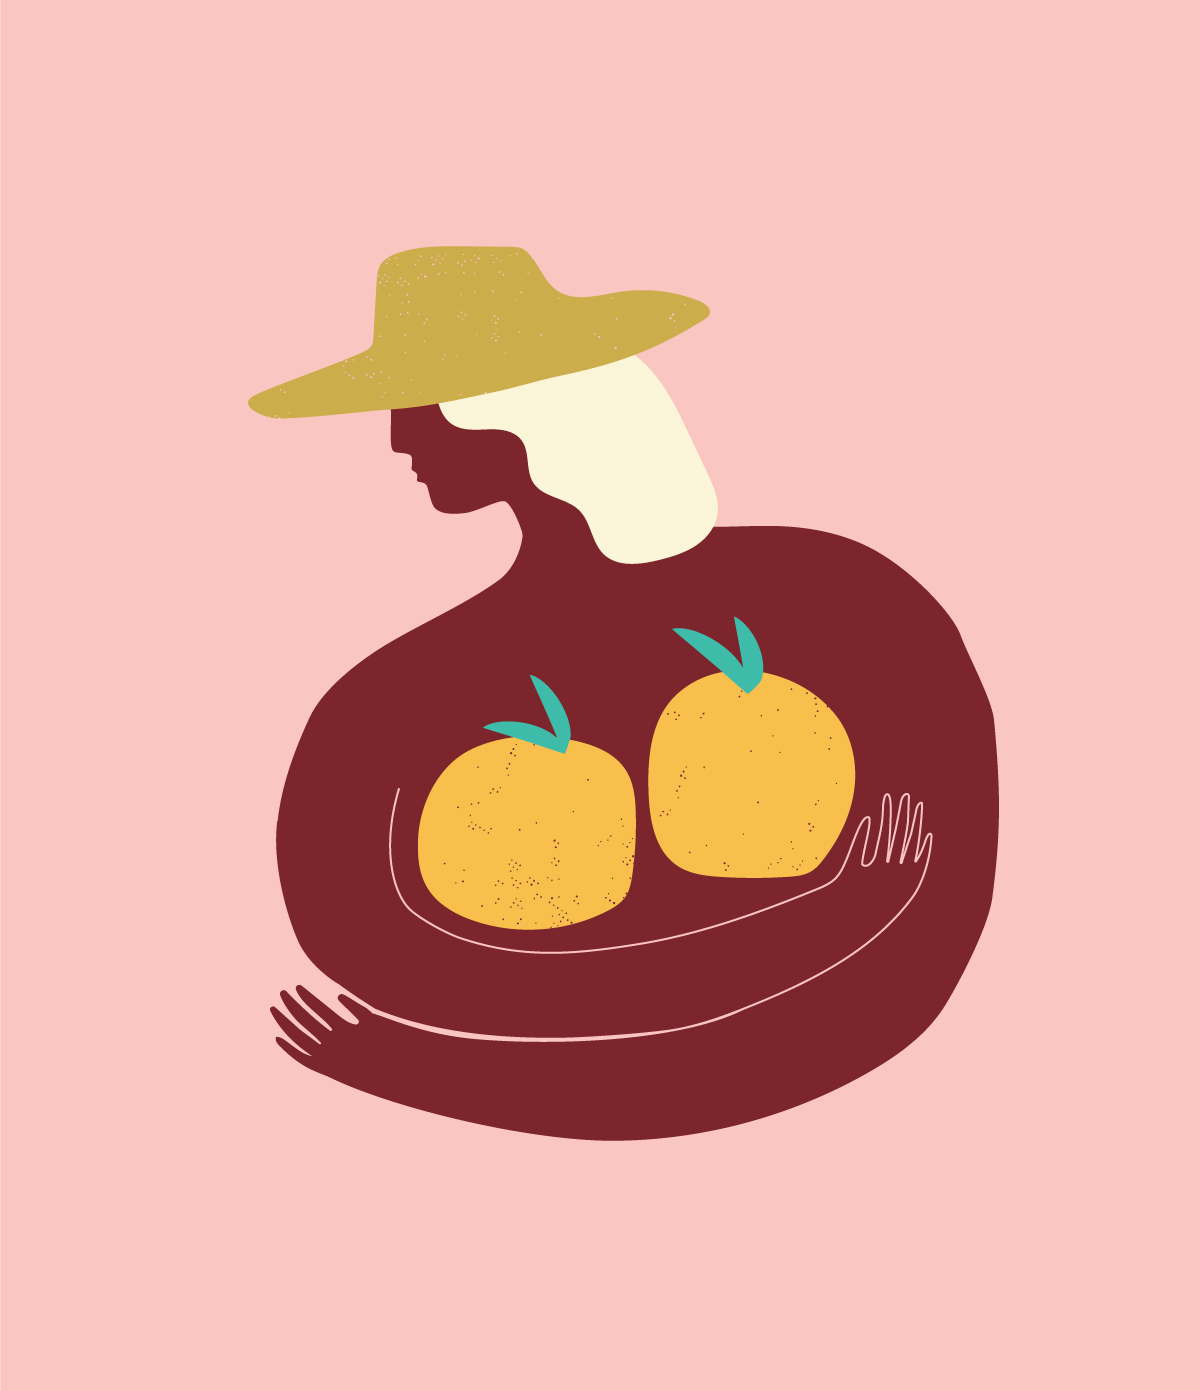 honeyandrust_viscayawagner_bounty_illustration.jpg